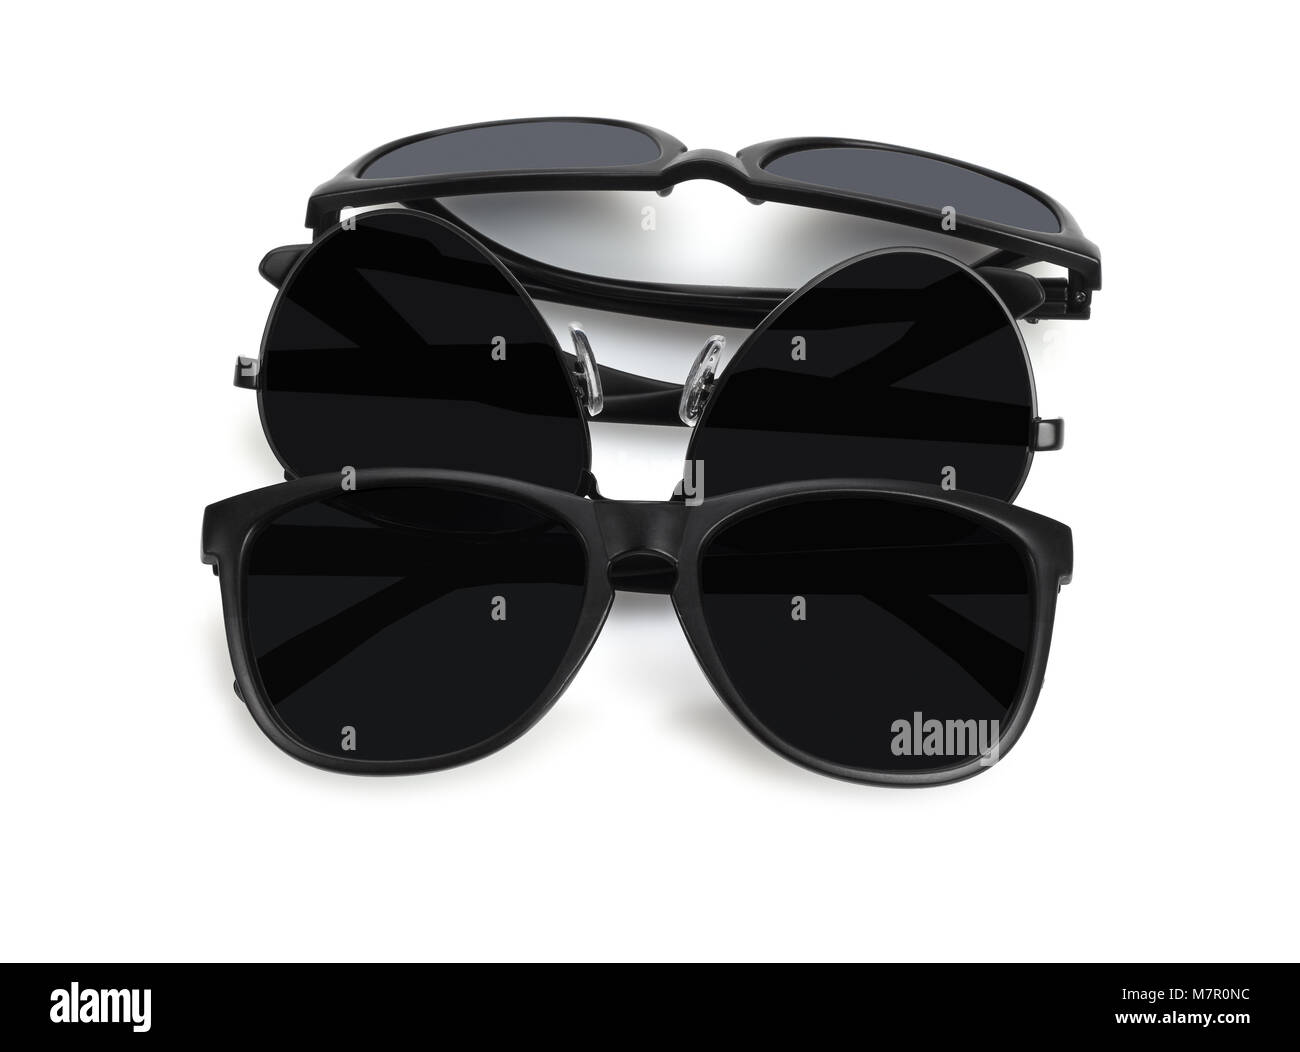 c1a077c7162 Sunglasses Cutout Stock Photos   Sunglasses Cutout Stock Images ...